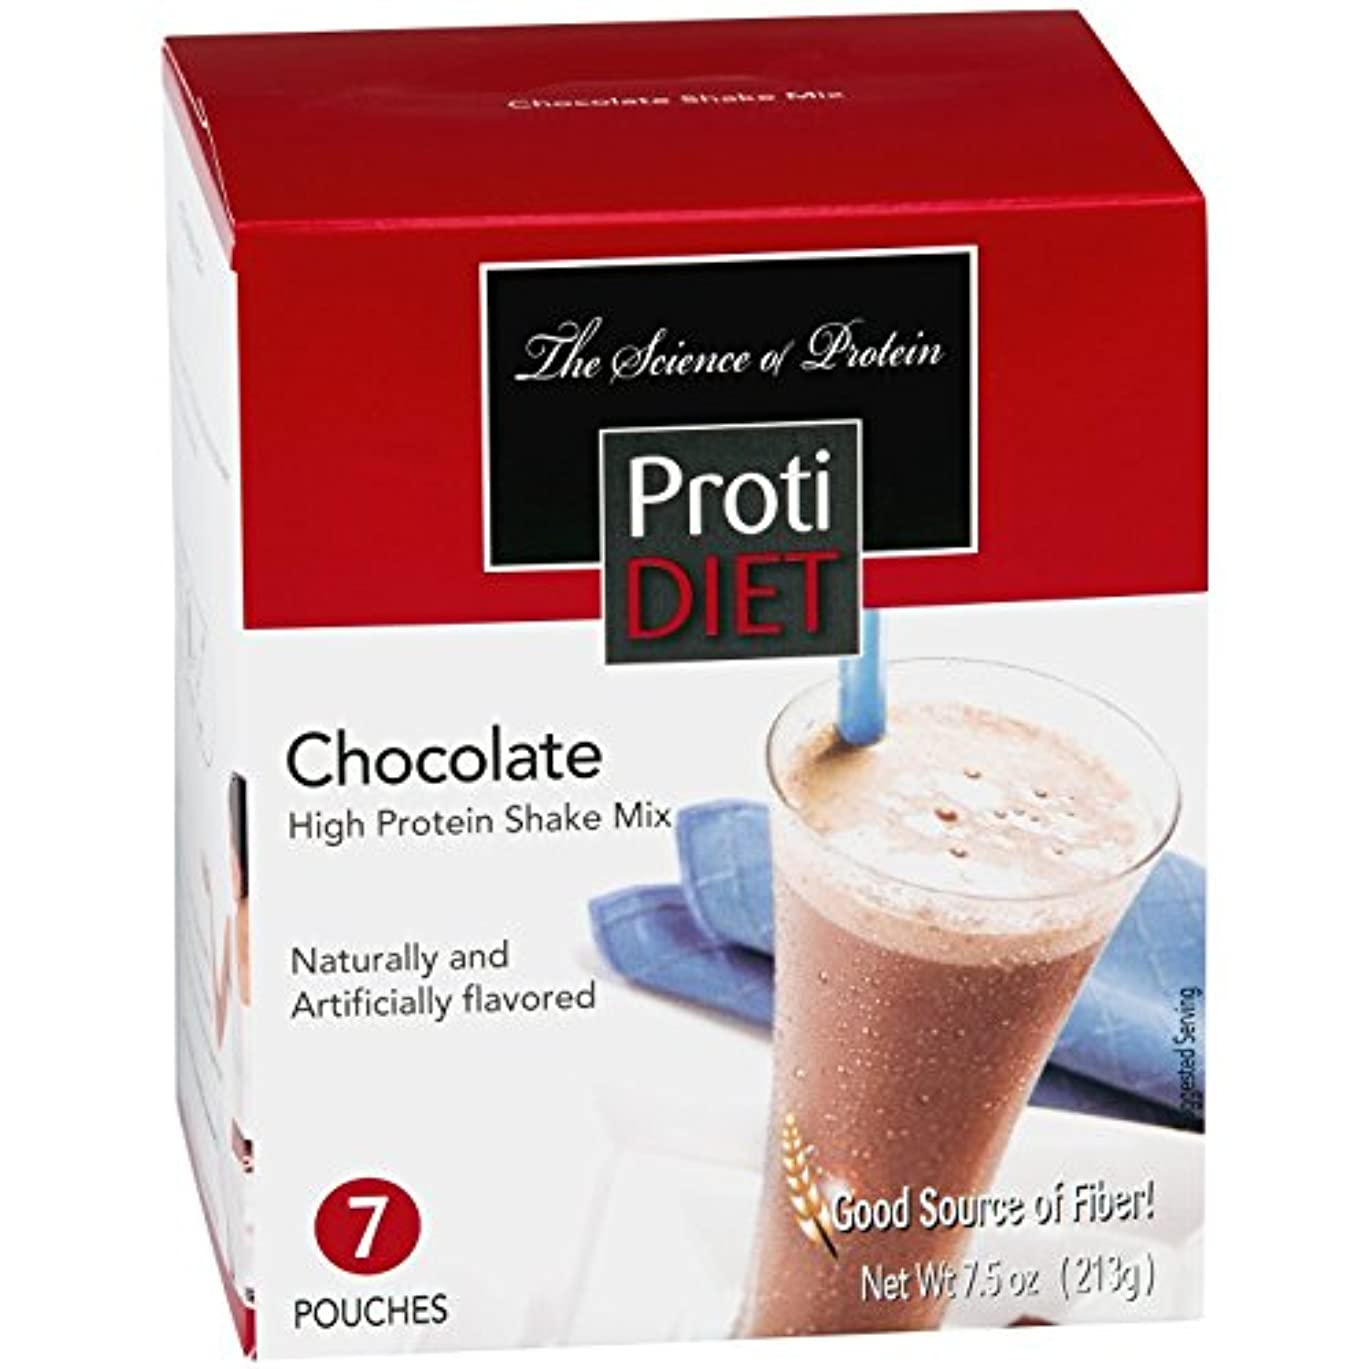 Proti Diet Chocolate Shake (7 pouches per box) Net Wt 7.5oz (213g) by Protidiet